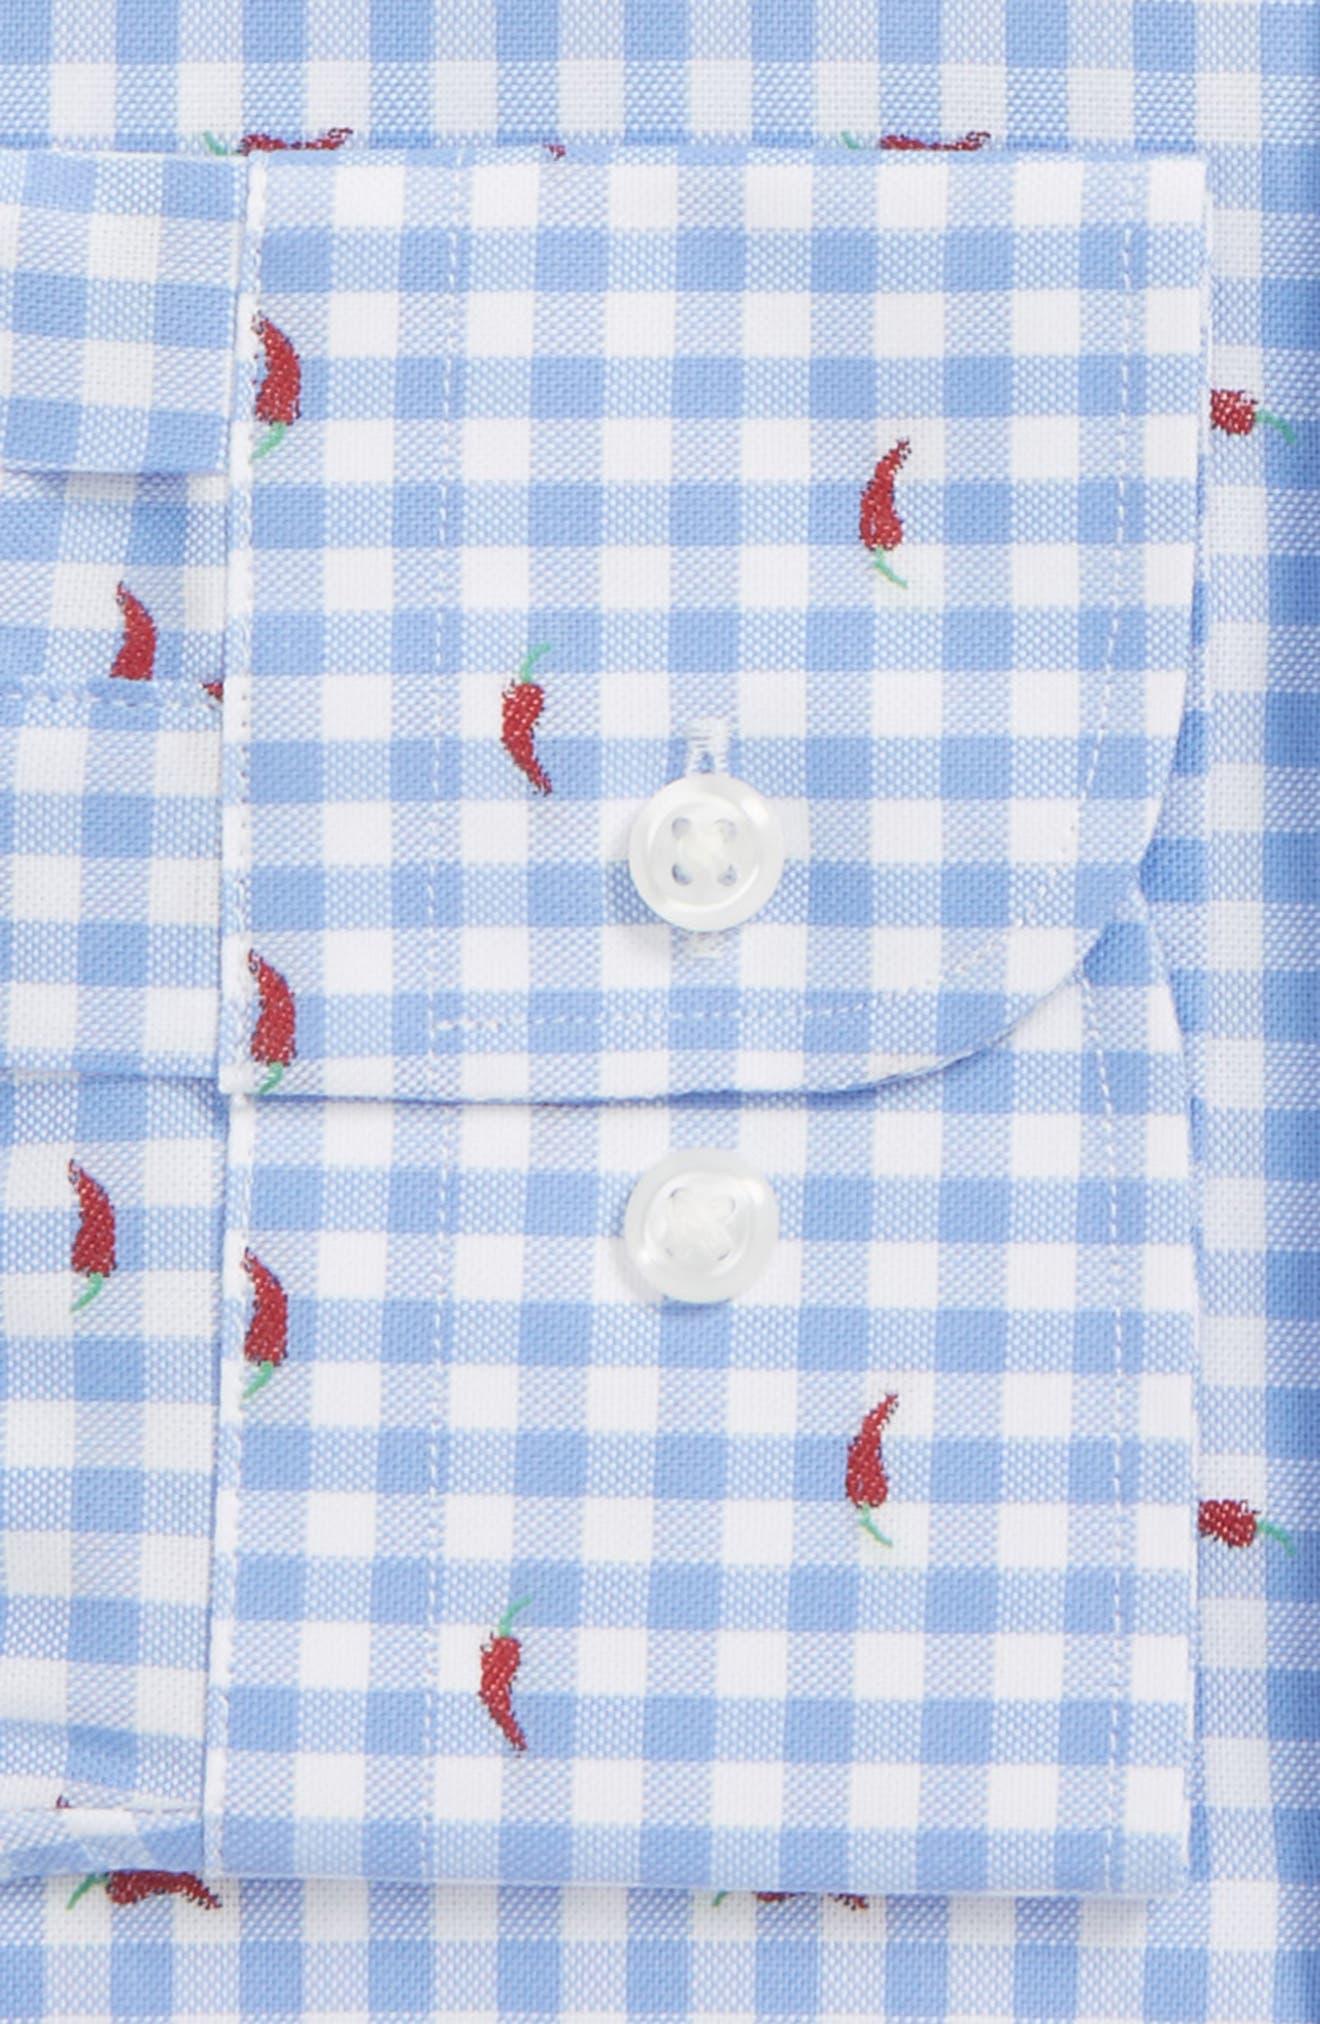 Trim Fit Gingham Chili Pepper Dress Shirt,                             Alternate thumbnail 6, color,                             450